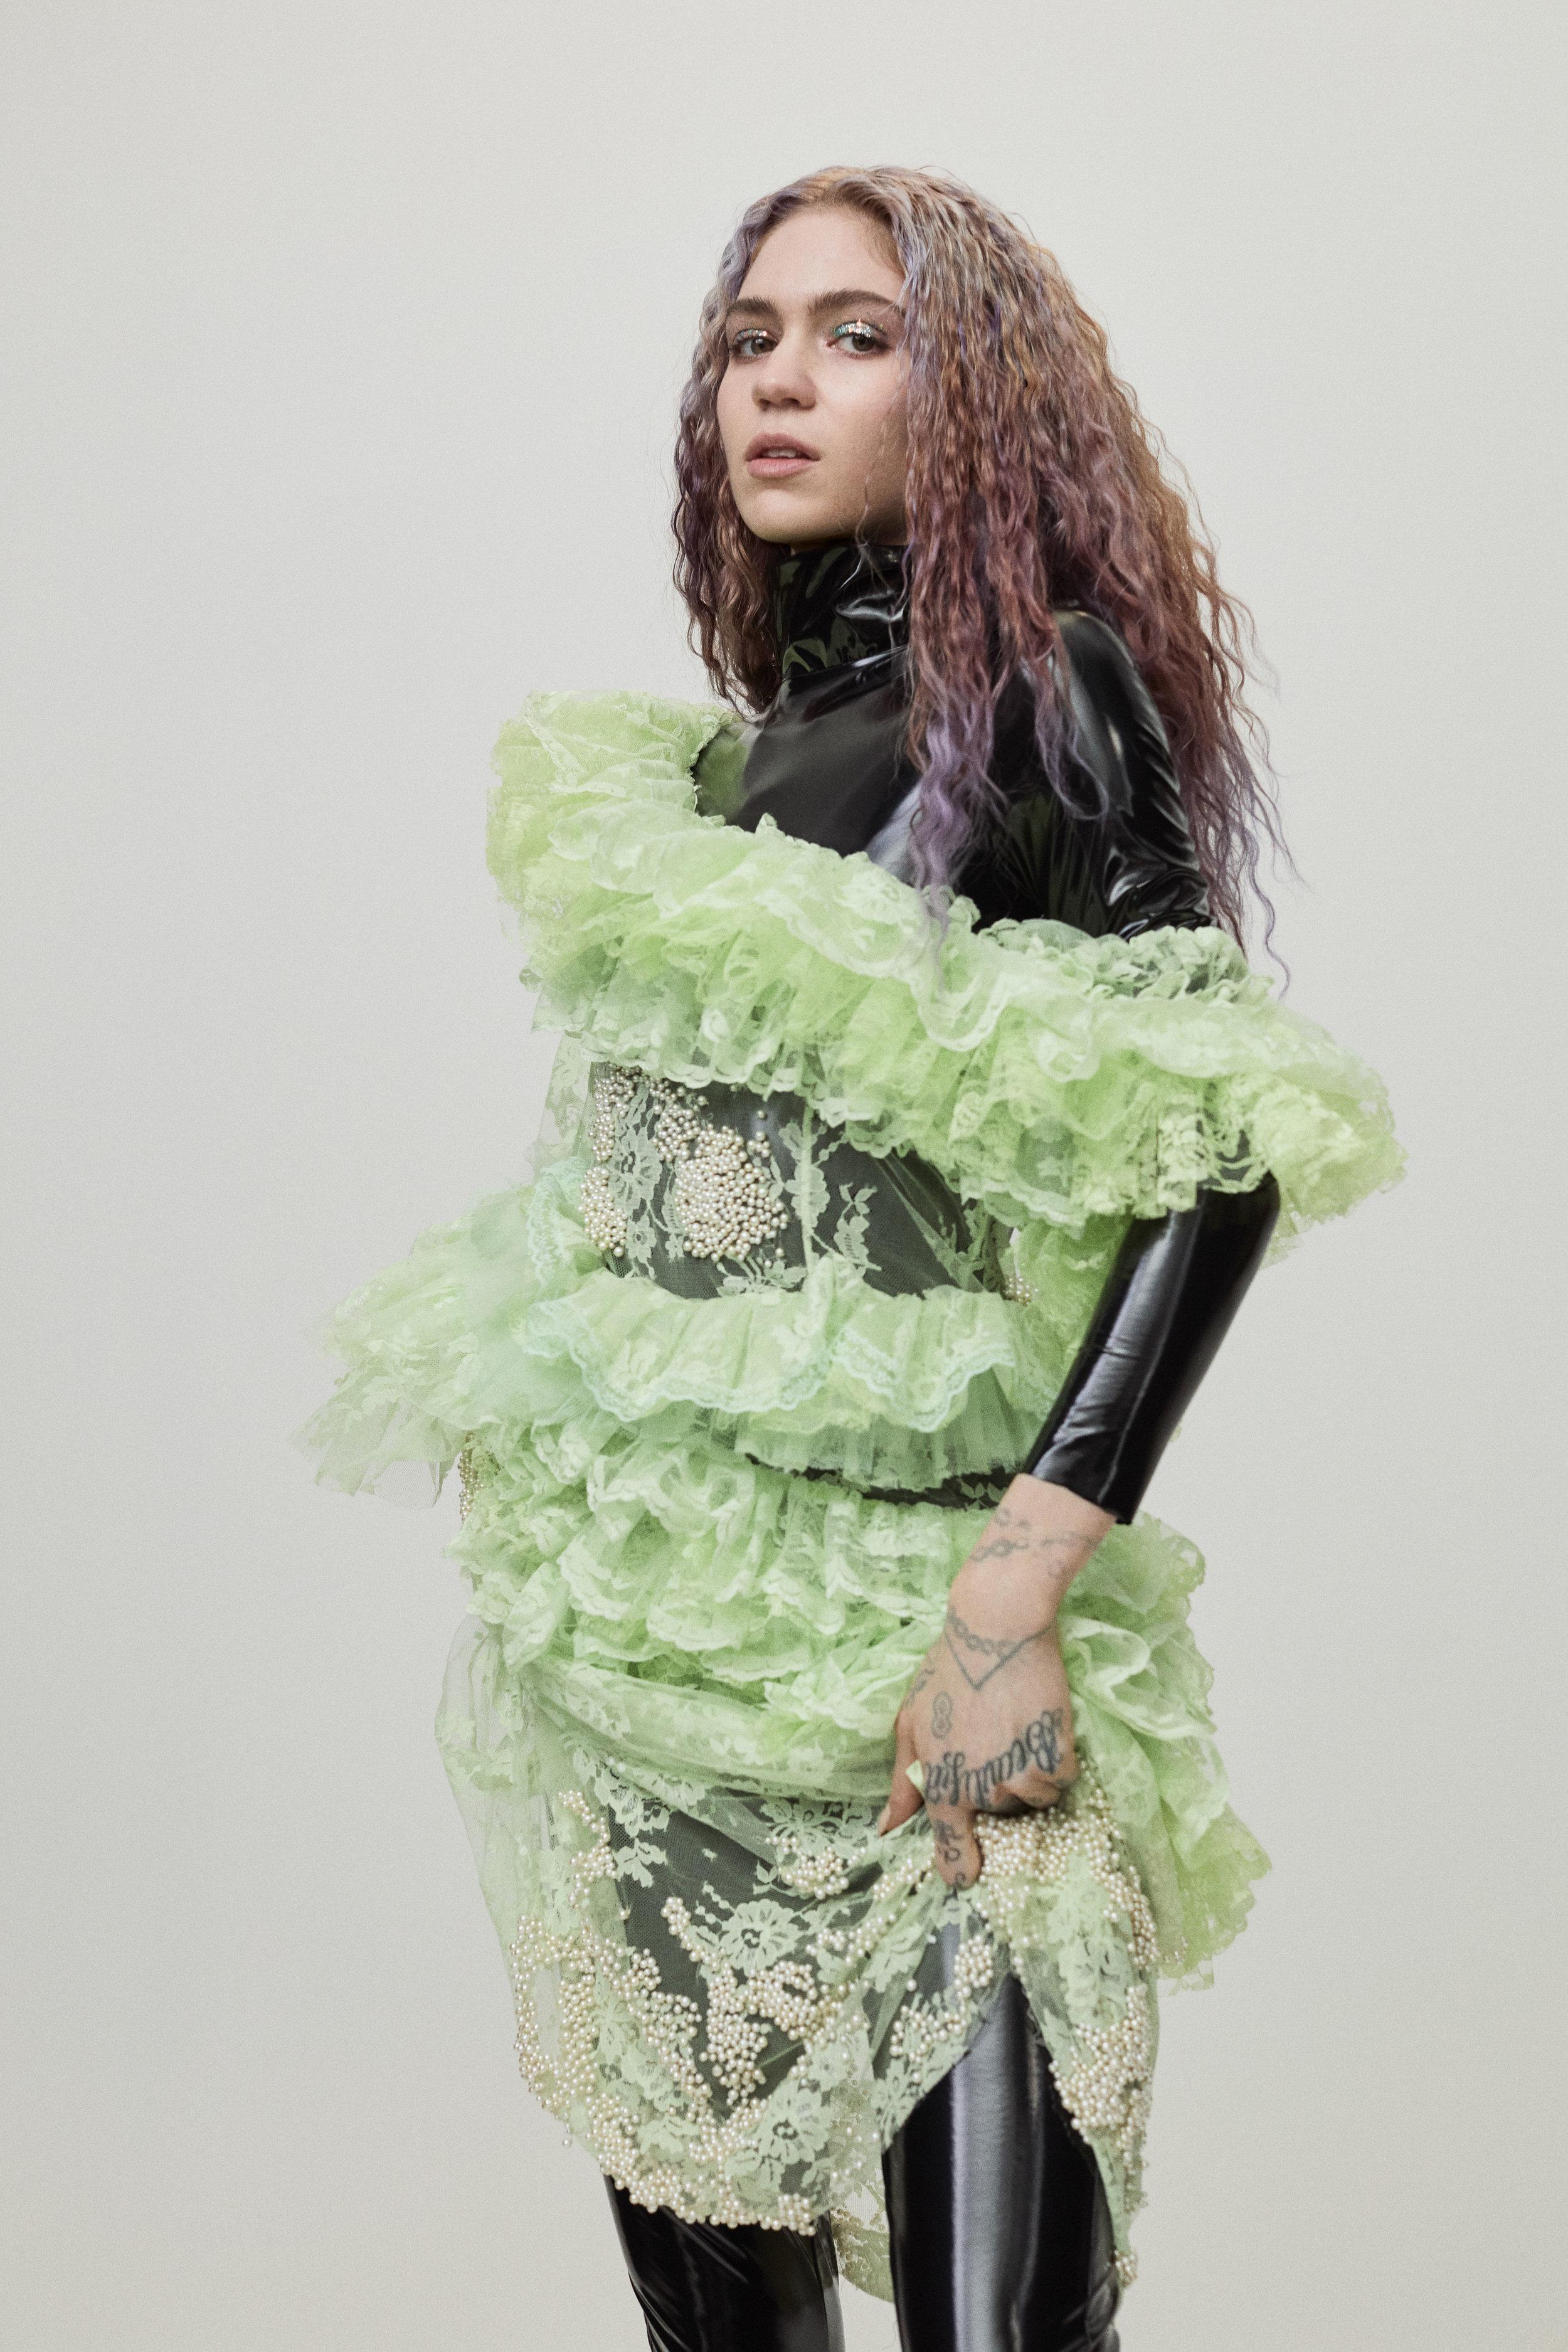 PREEN BY THORNTON BREGAZZI     dress and stylist's own bodysuit